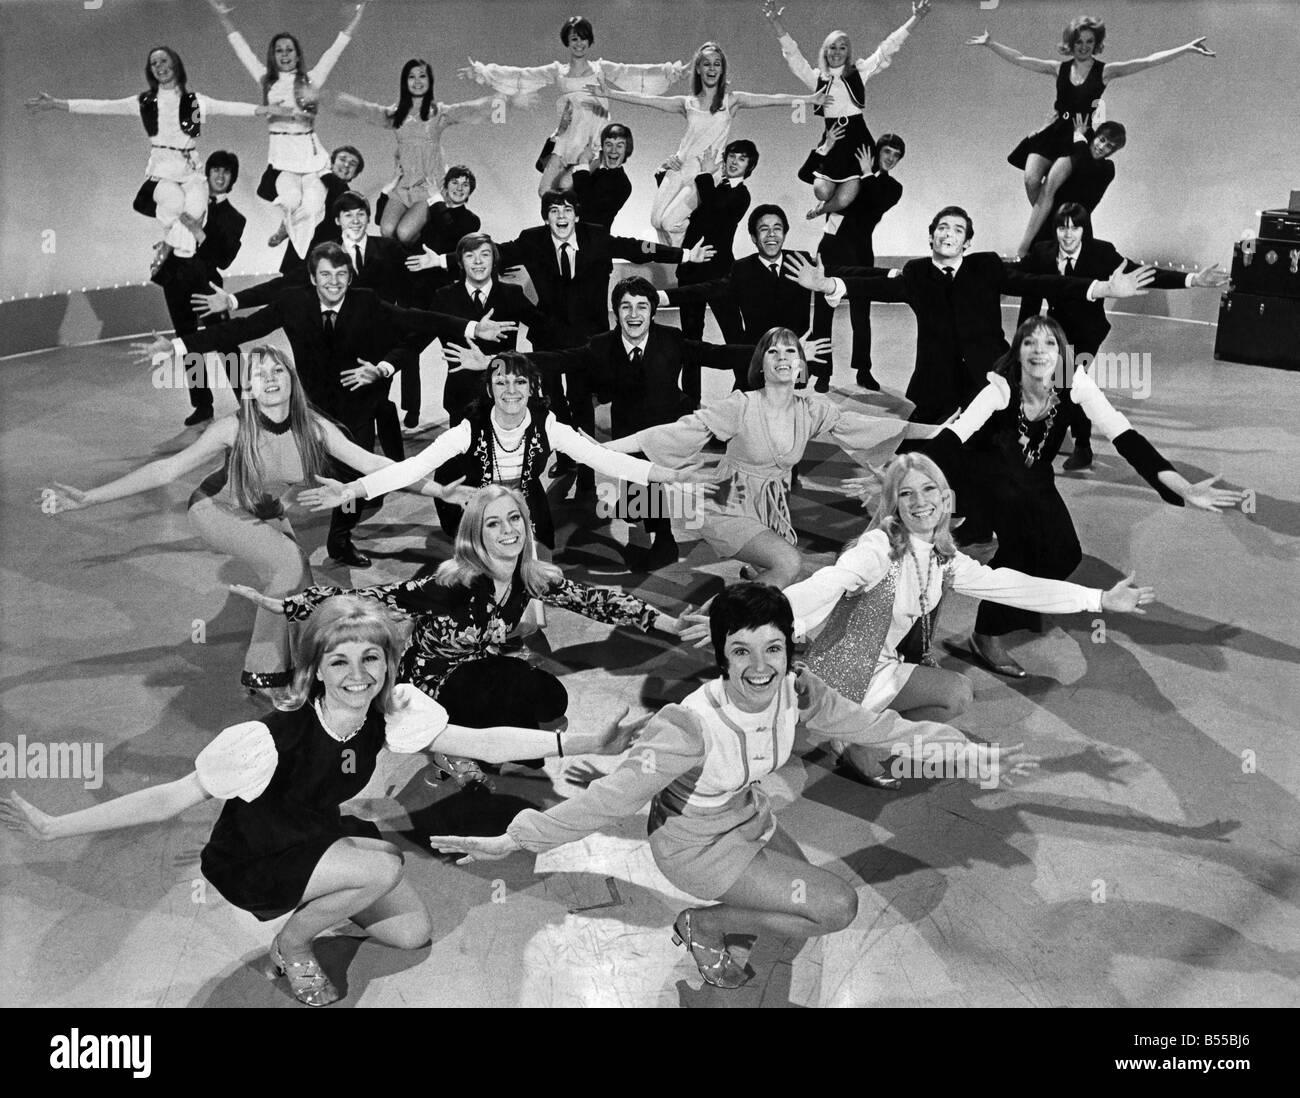 Dancing chorus and stage: 1, Lynda Herbert (aged 19), West Byfleet; 2, Jane Herbert (19), West Byfleet; 3, Wei-Wei Stock Photo